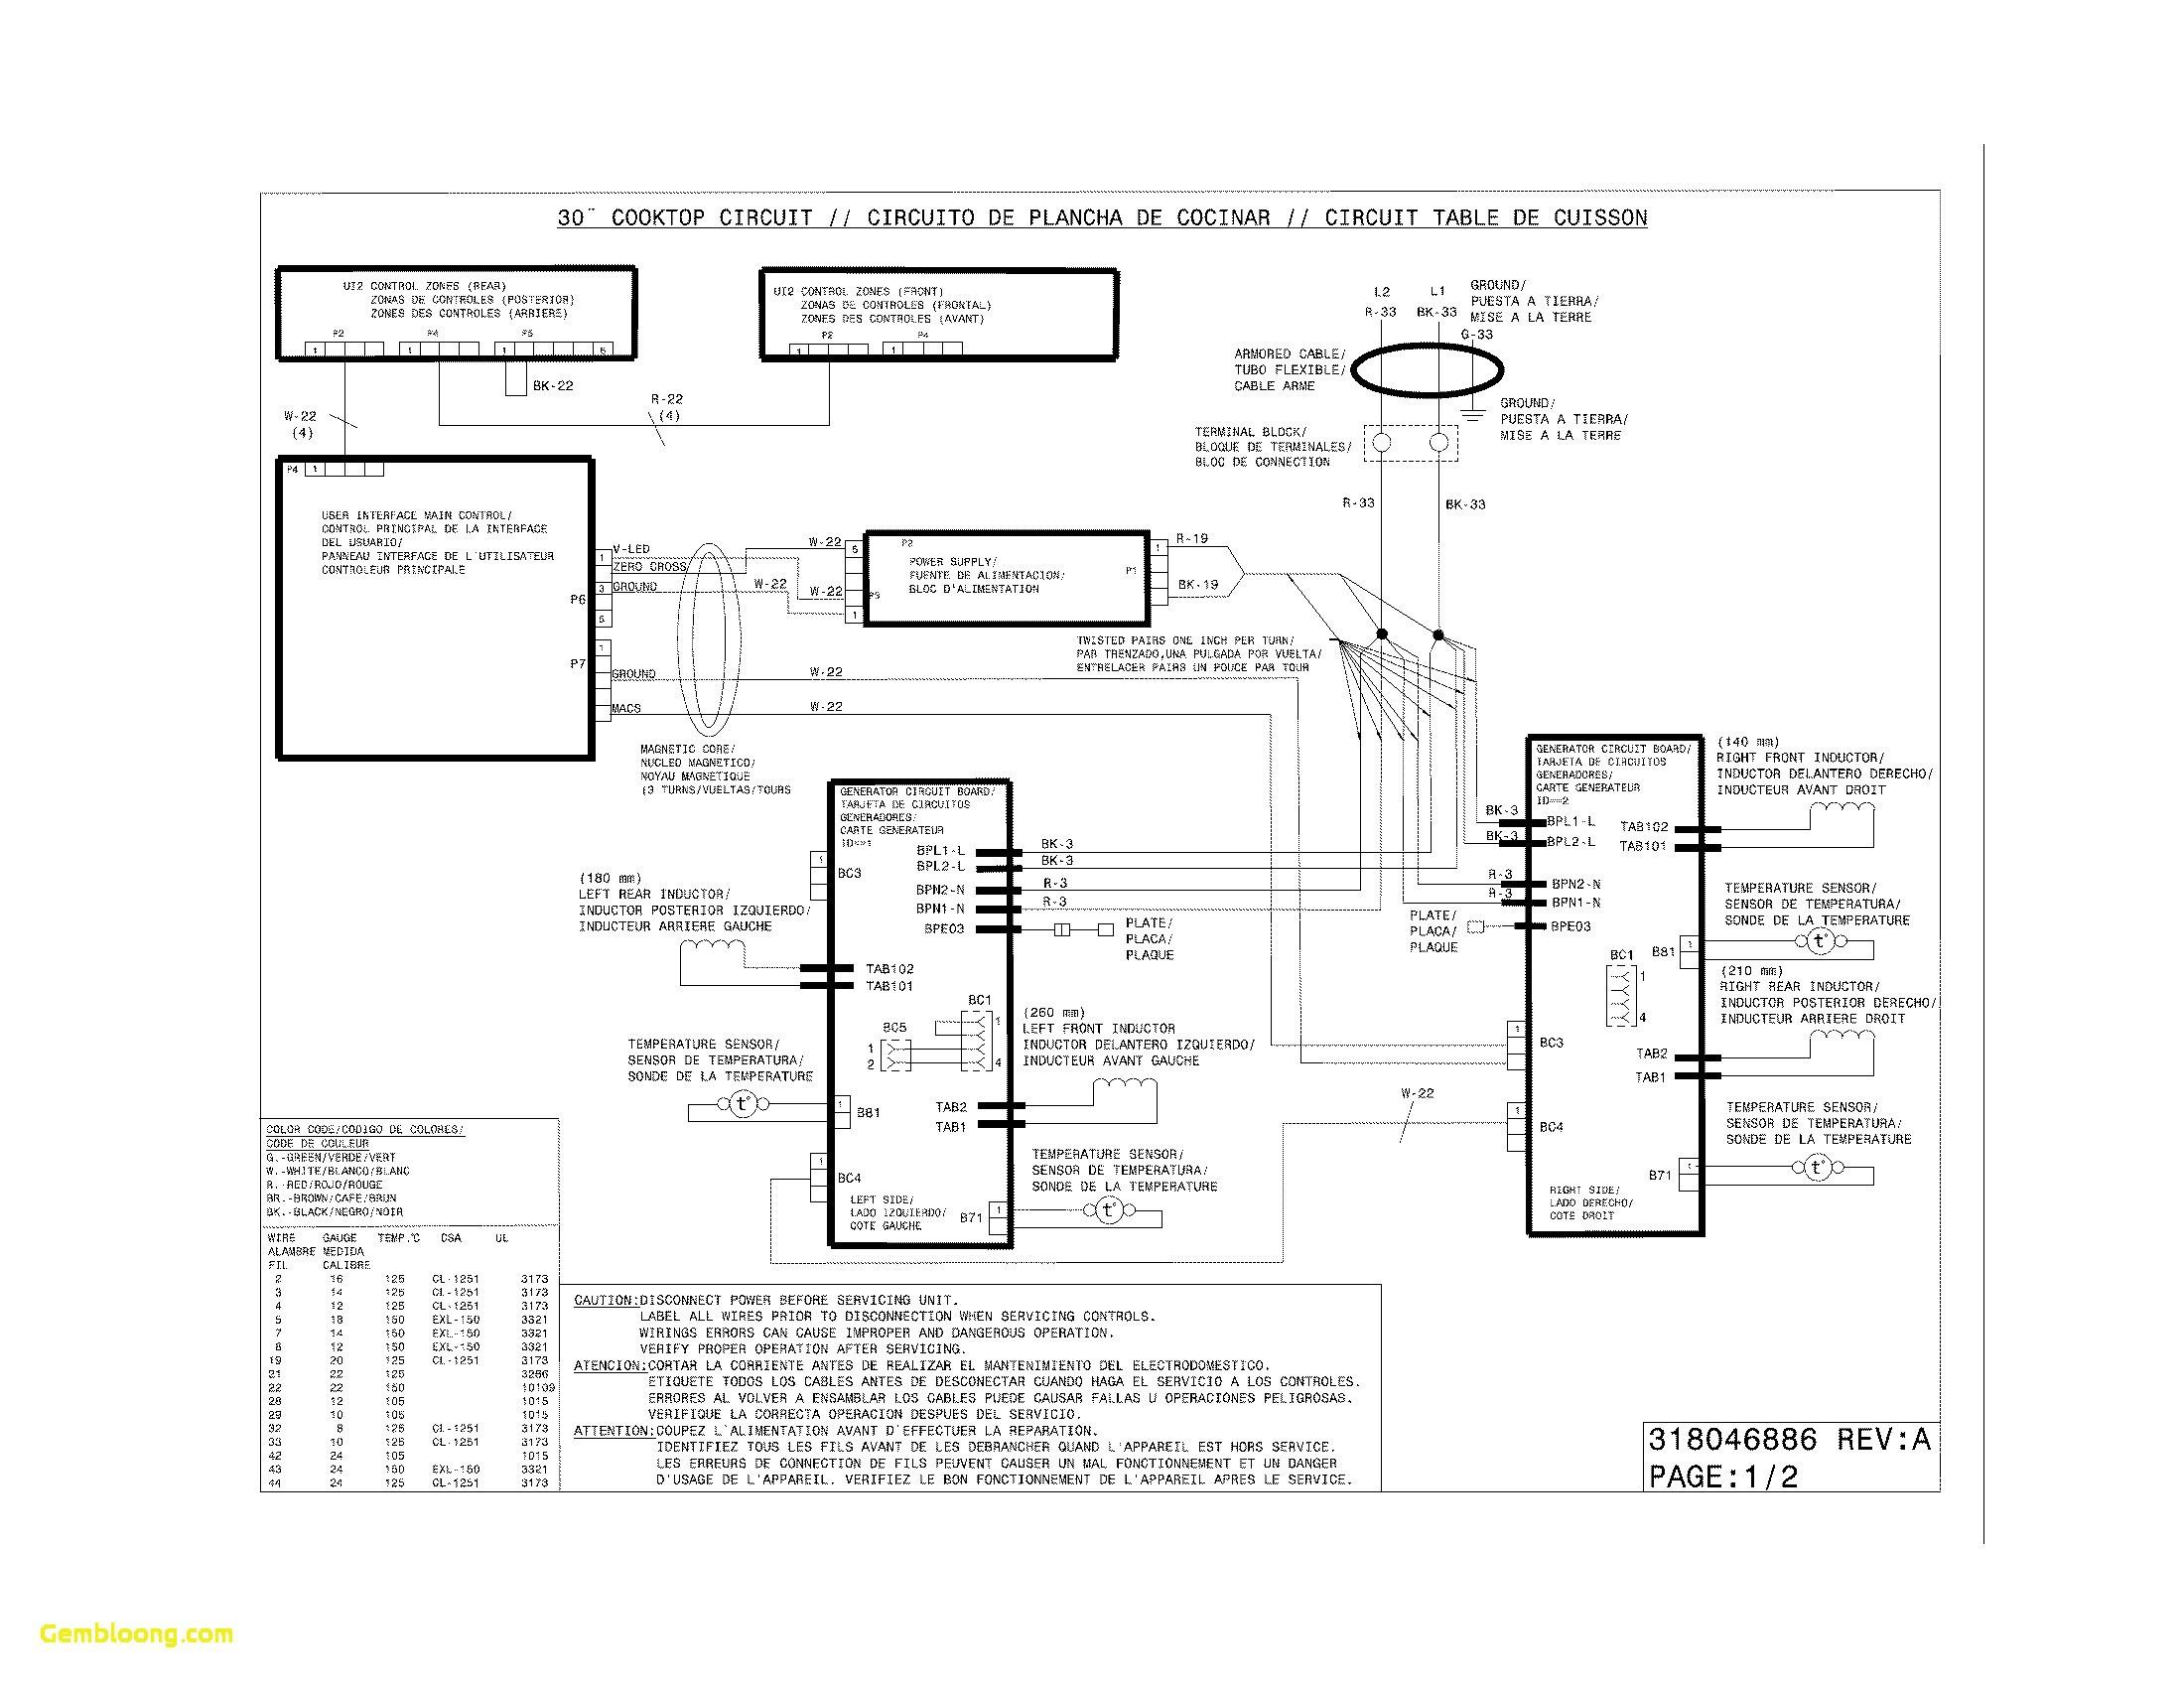 Peachy Craftsman Garage Door Opener Sensor Wiring Diagram Gallery Wiring Cloud Inklaidewilluminateatxorg